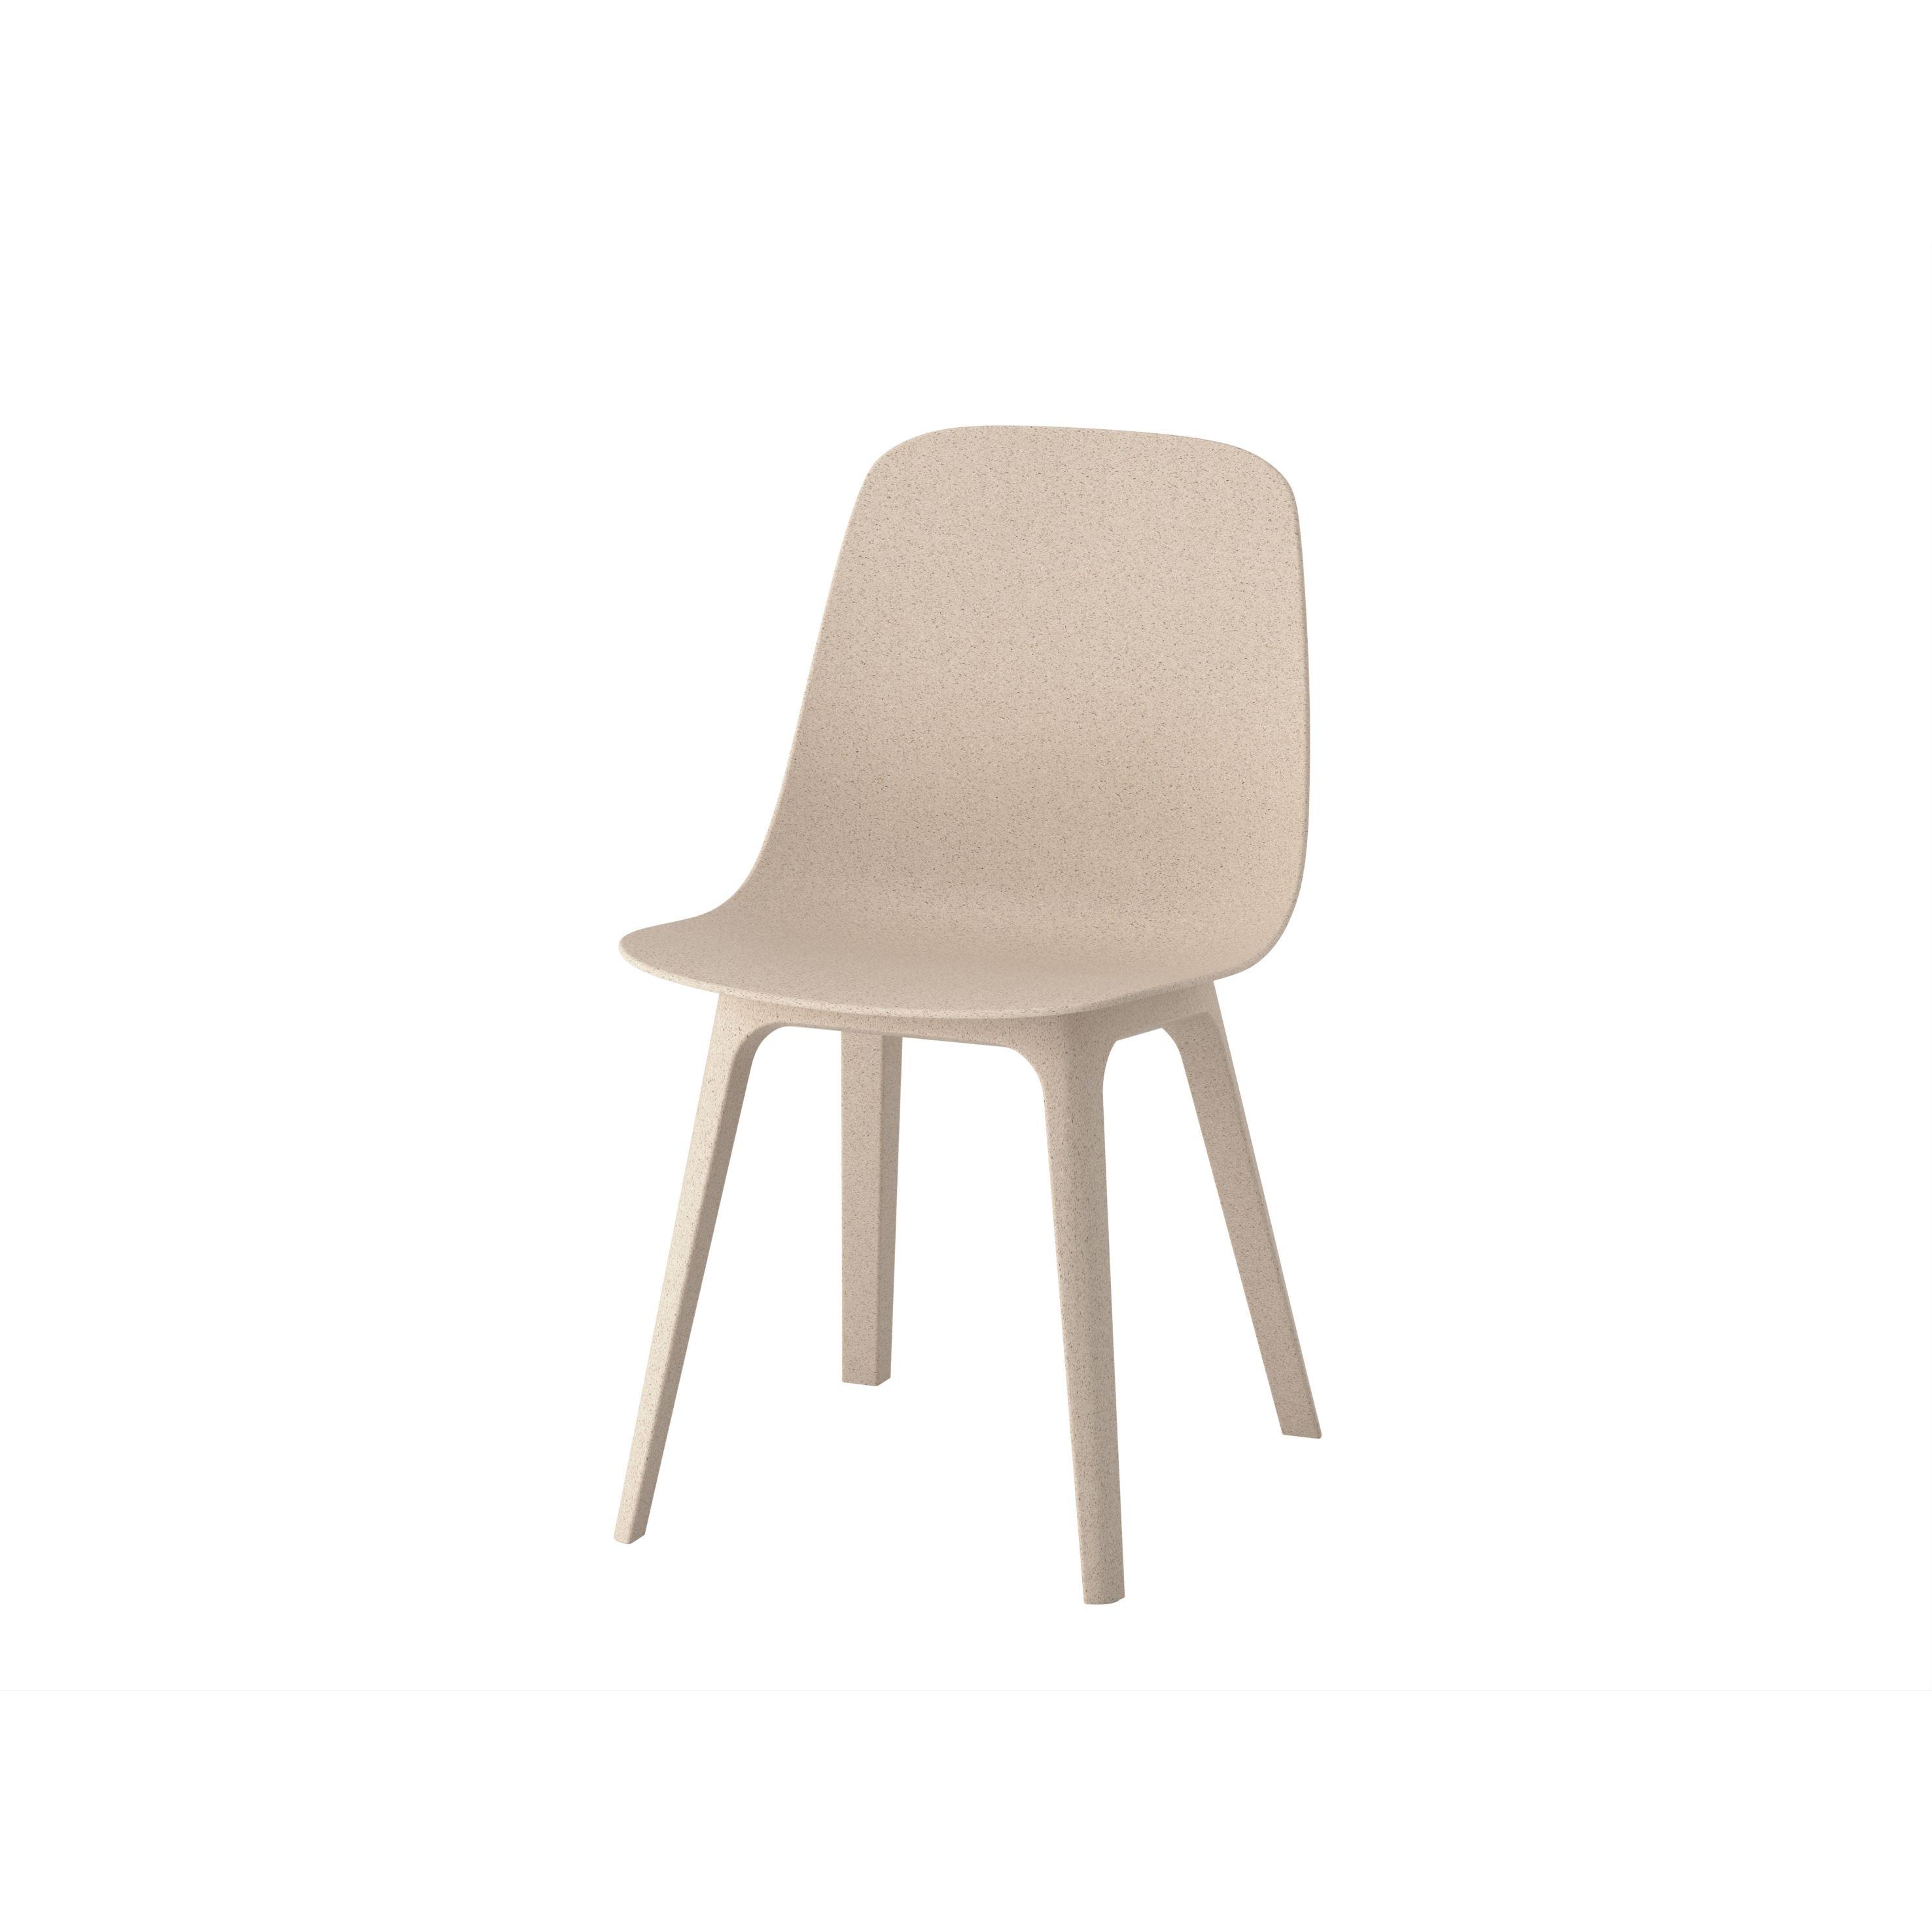 IKEA_ODGER_stol_PE640475.jpg (2953×2953)